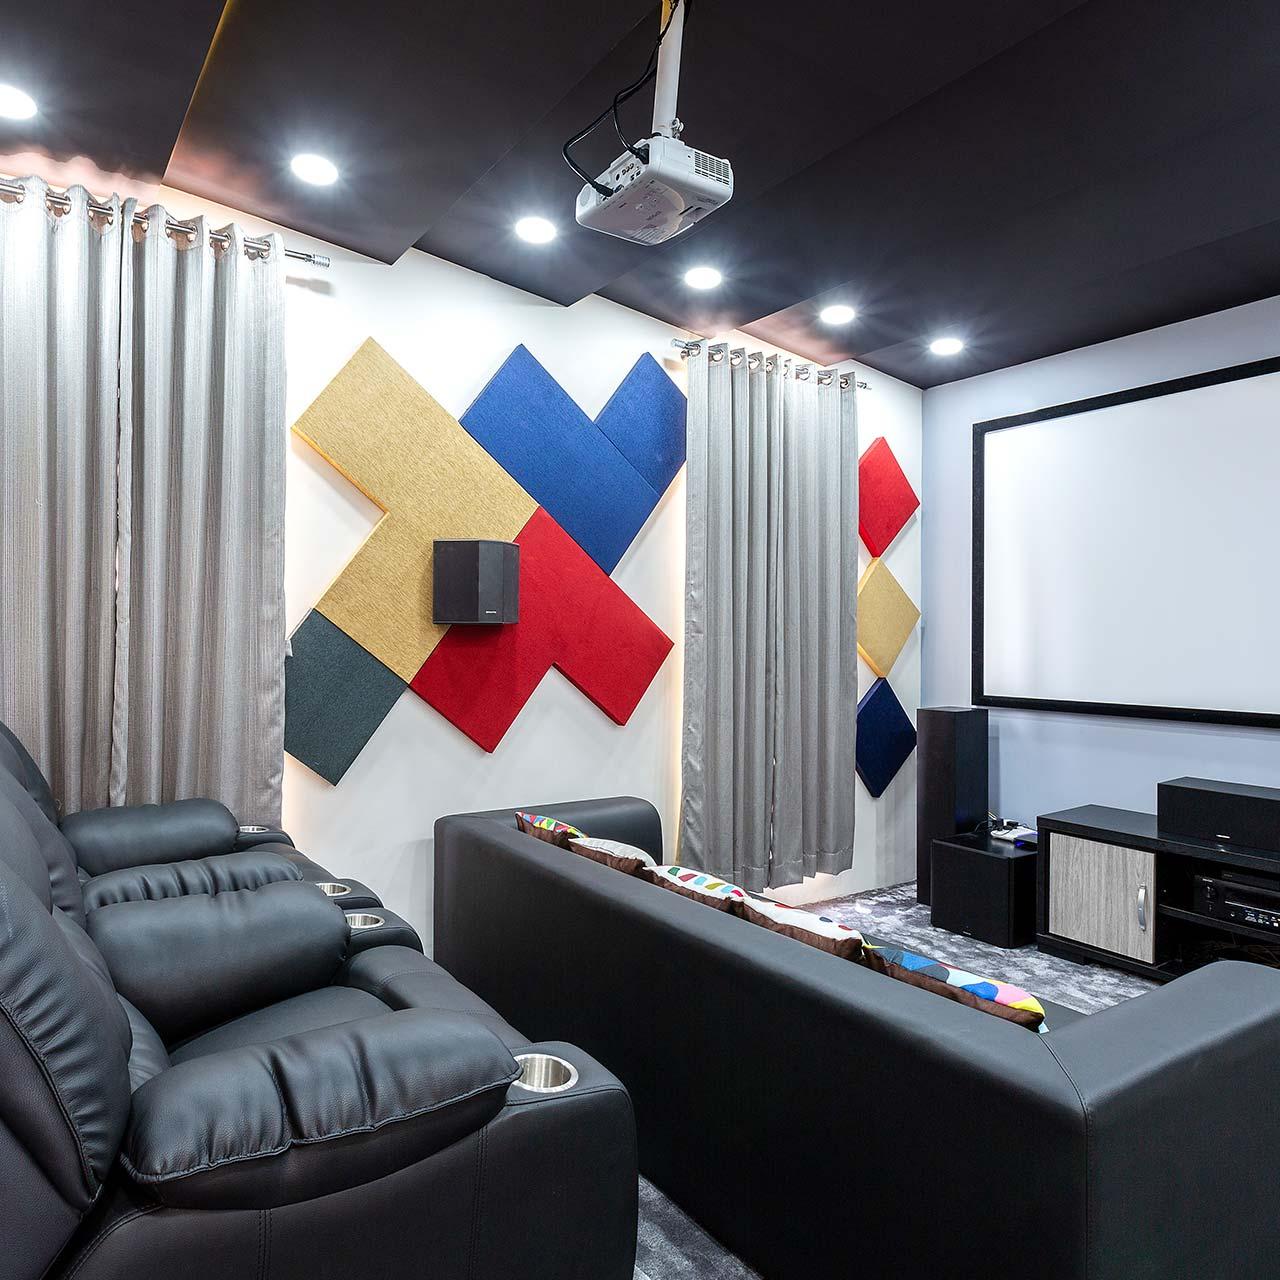 Plan Family Entertainment for Villa Design